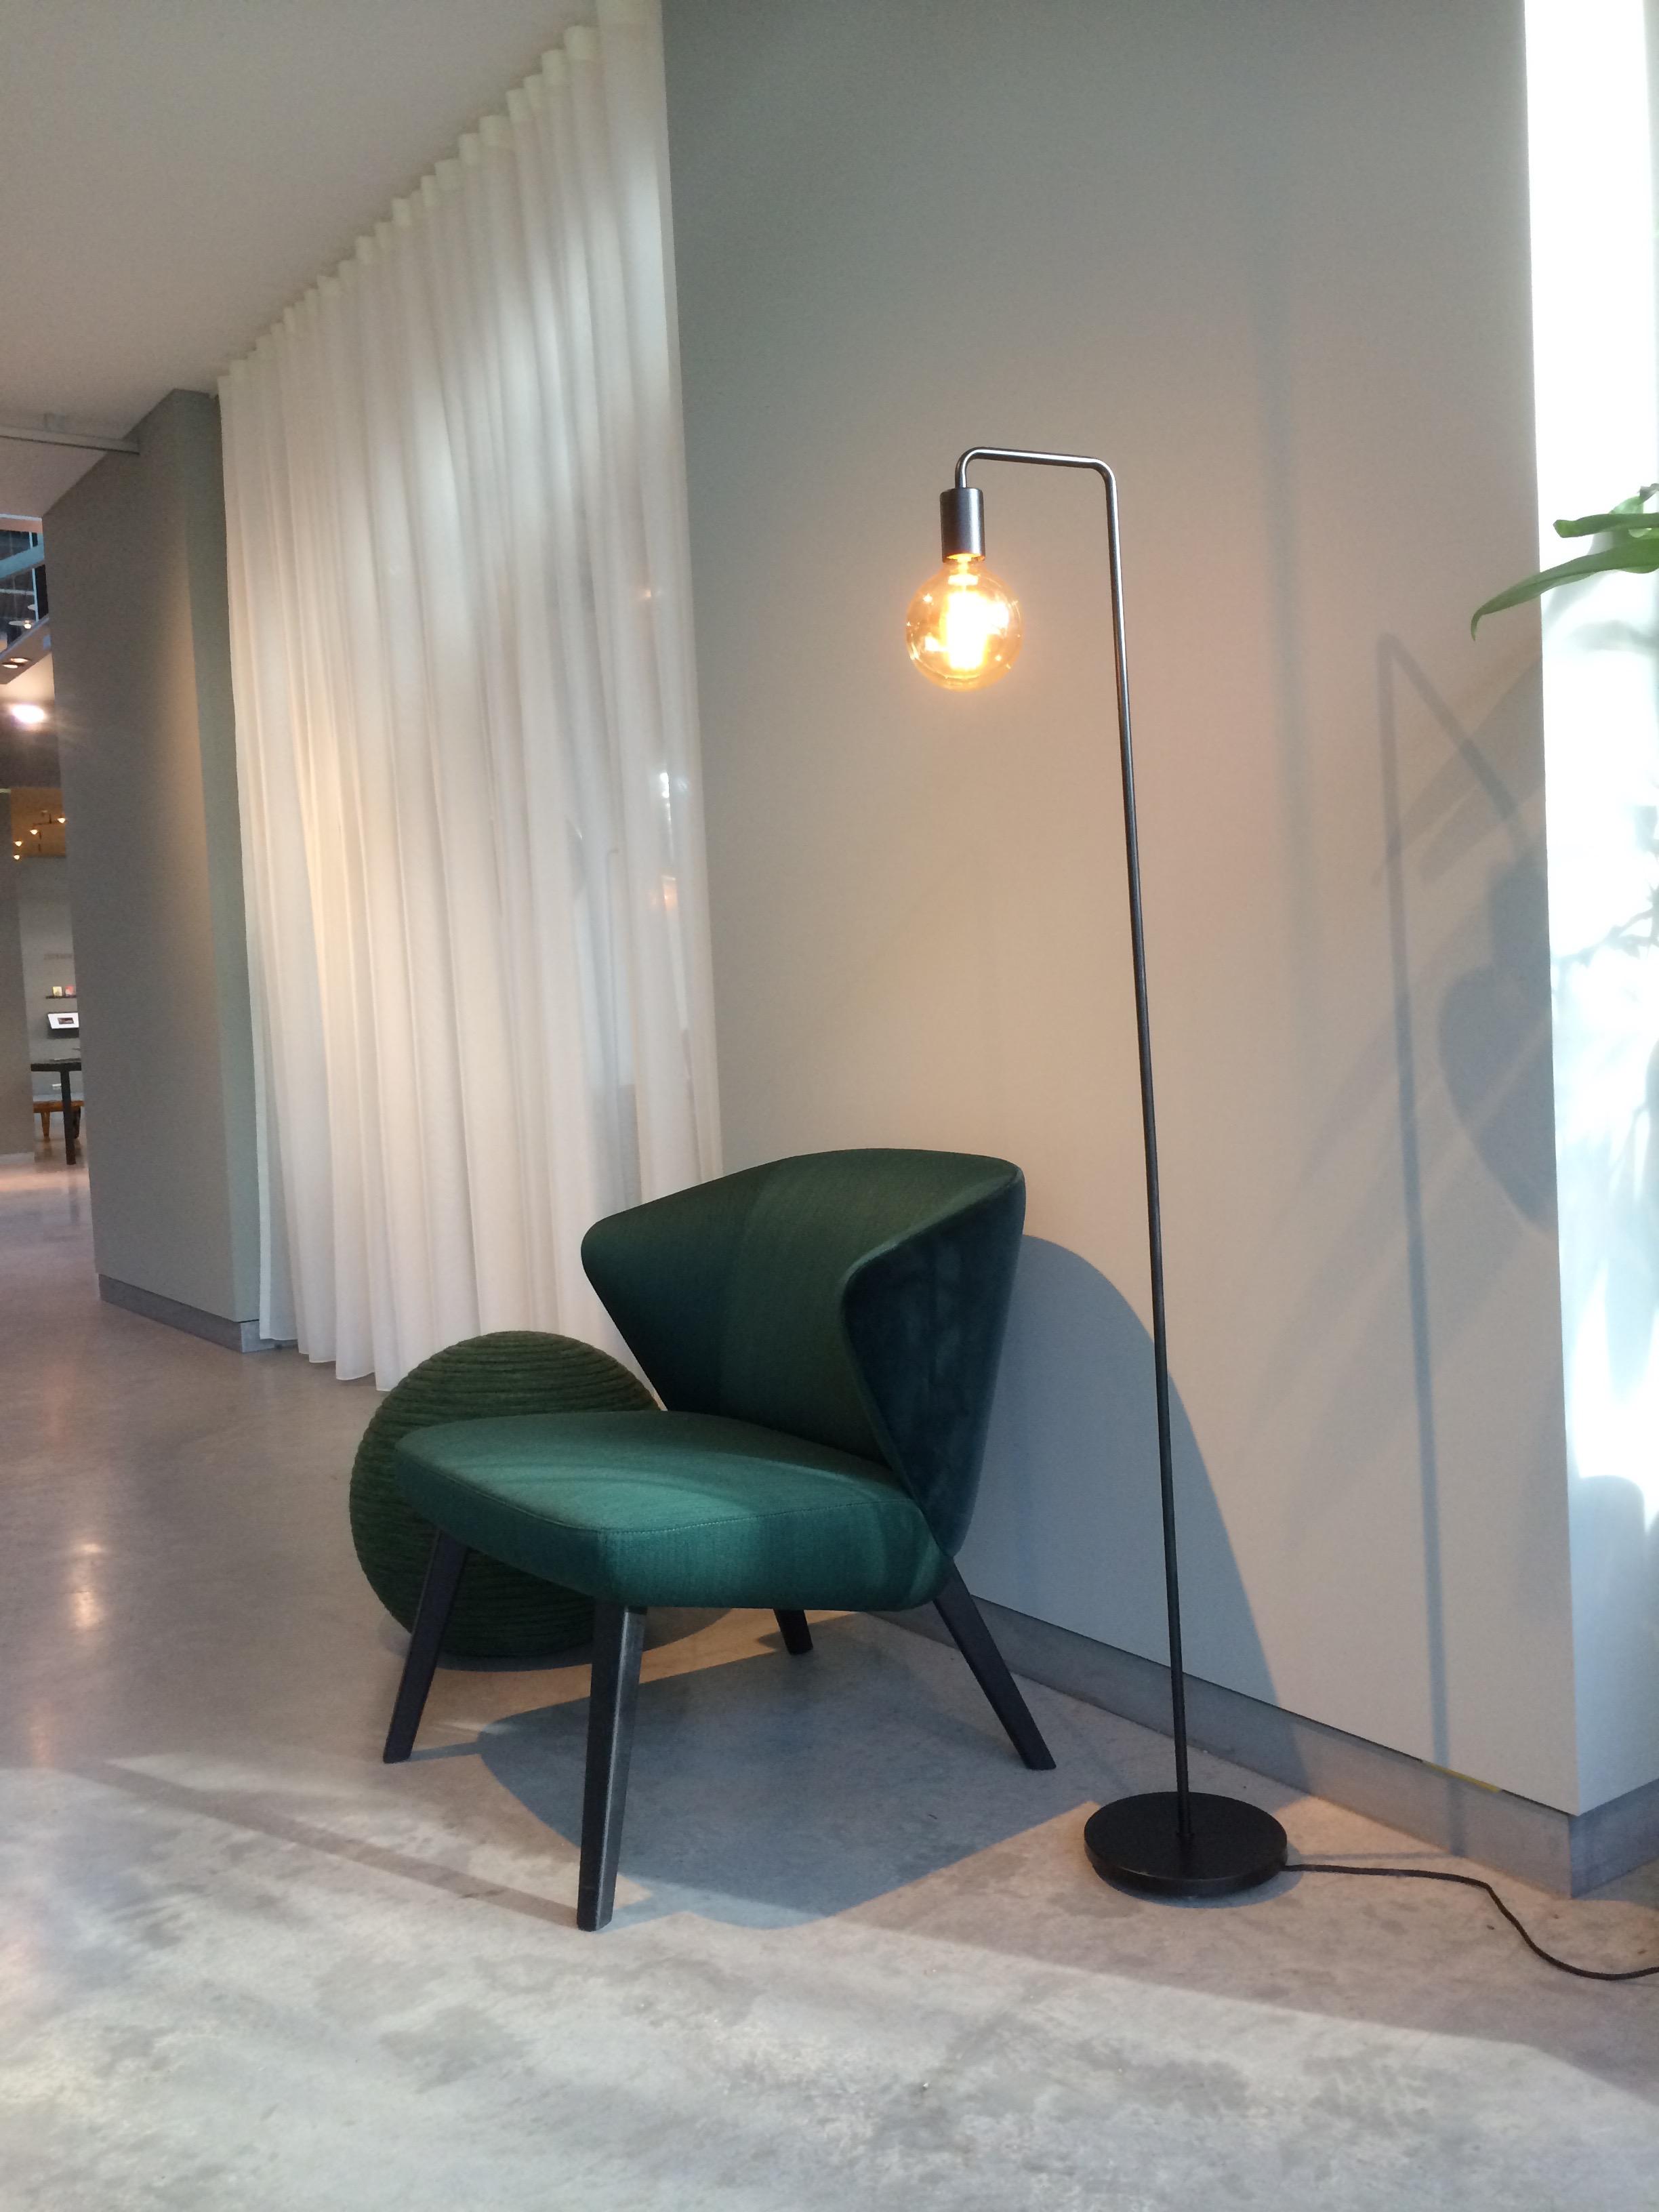 IMM Cologne Groen BackMeUp Salon